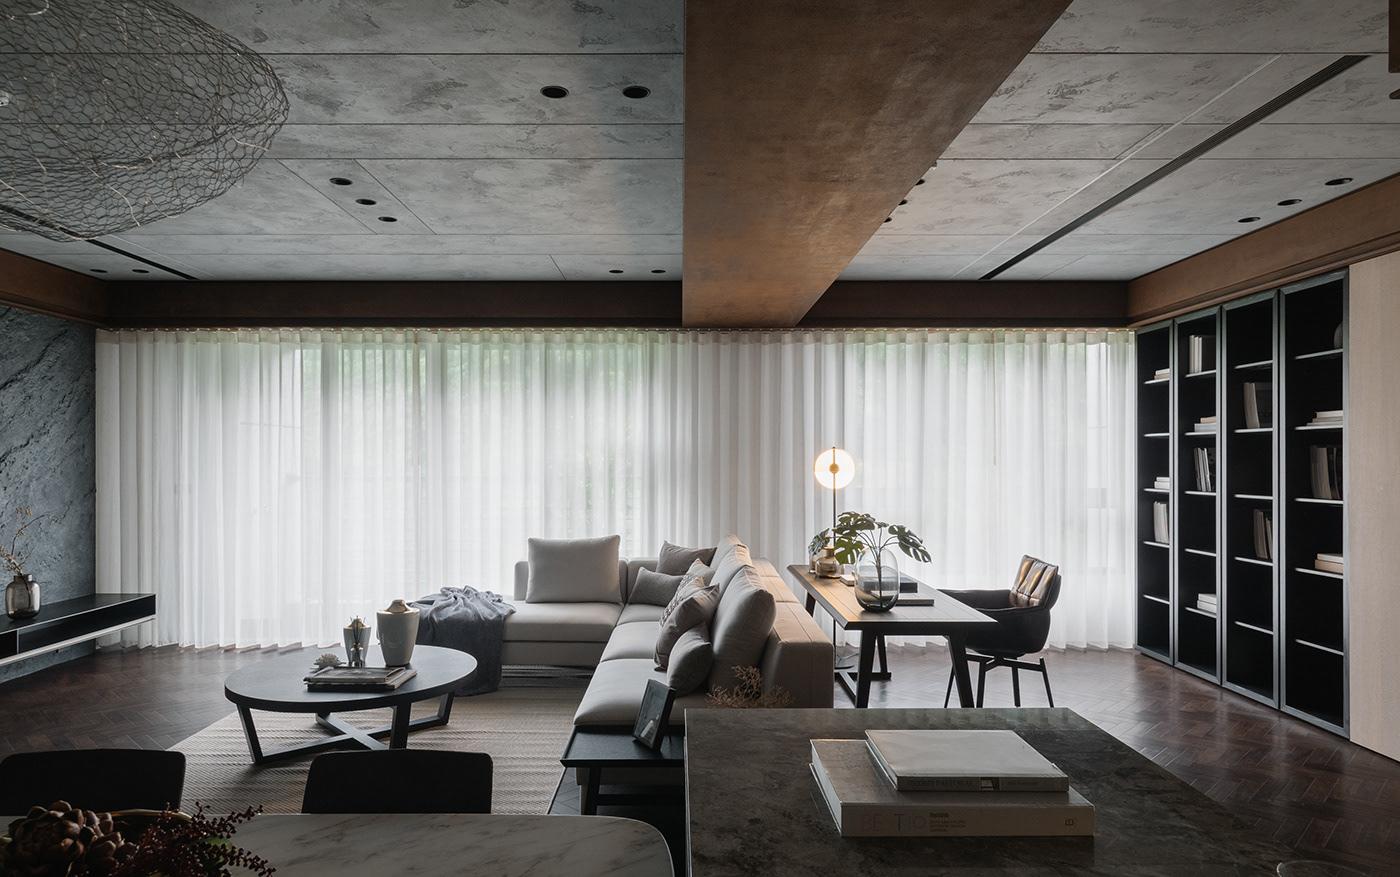 23design architects decoration Interior residential 二三設計 室內設計 居家裝飾 建築 空間攝影